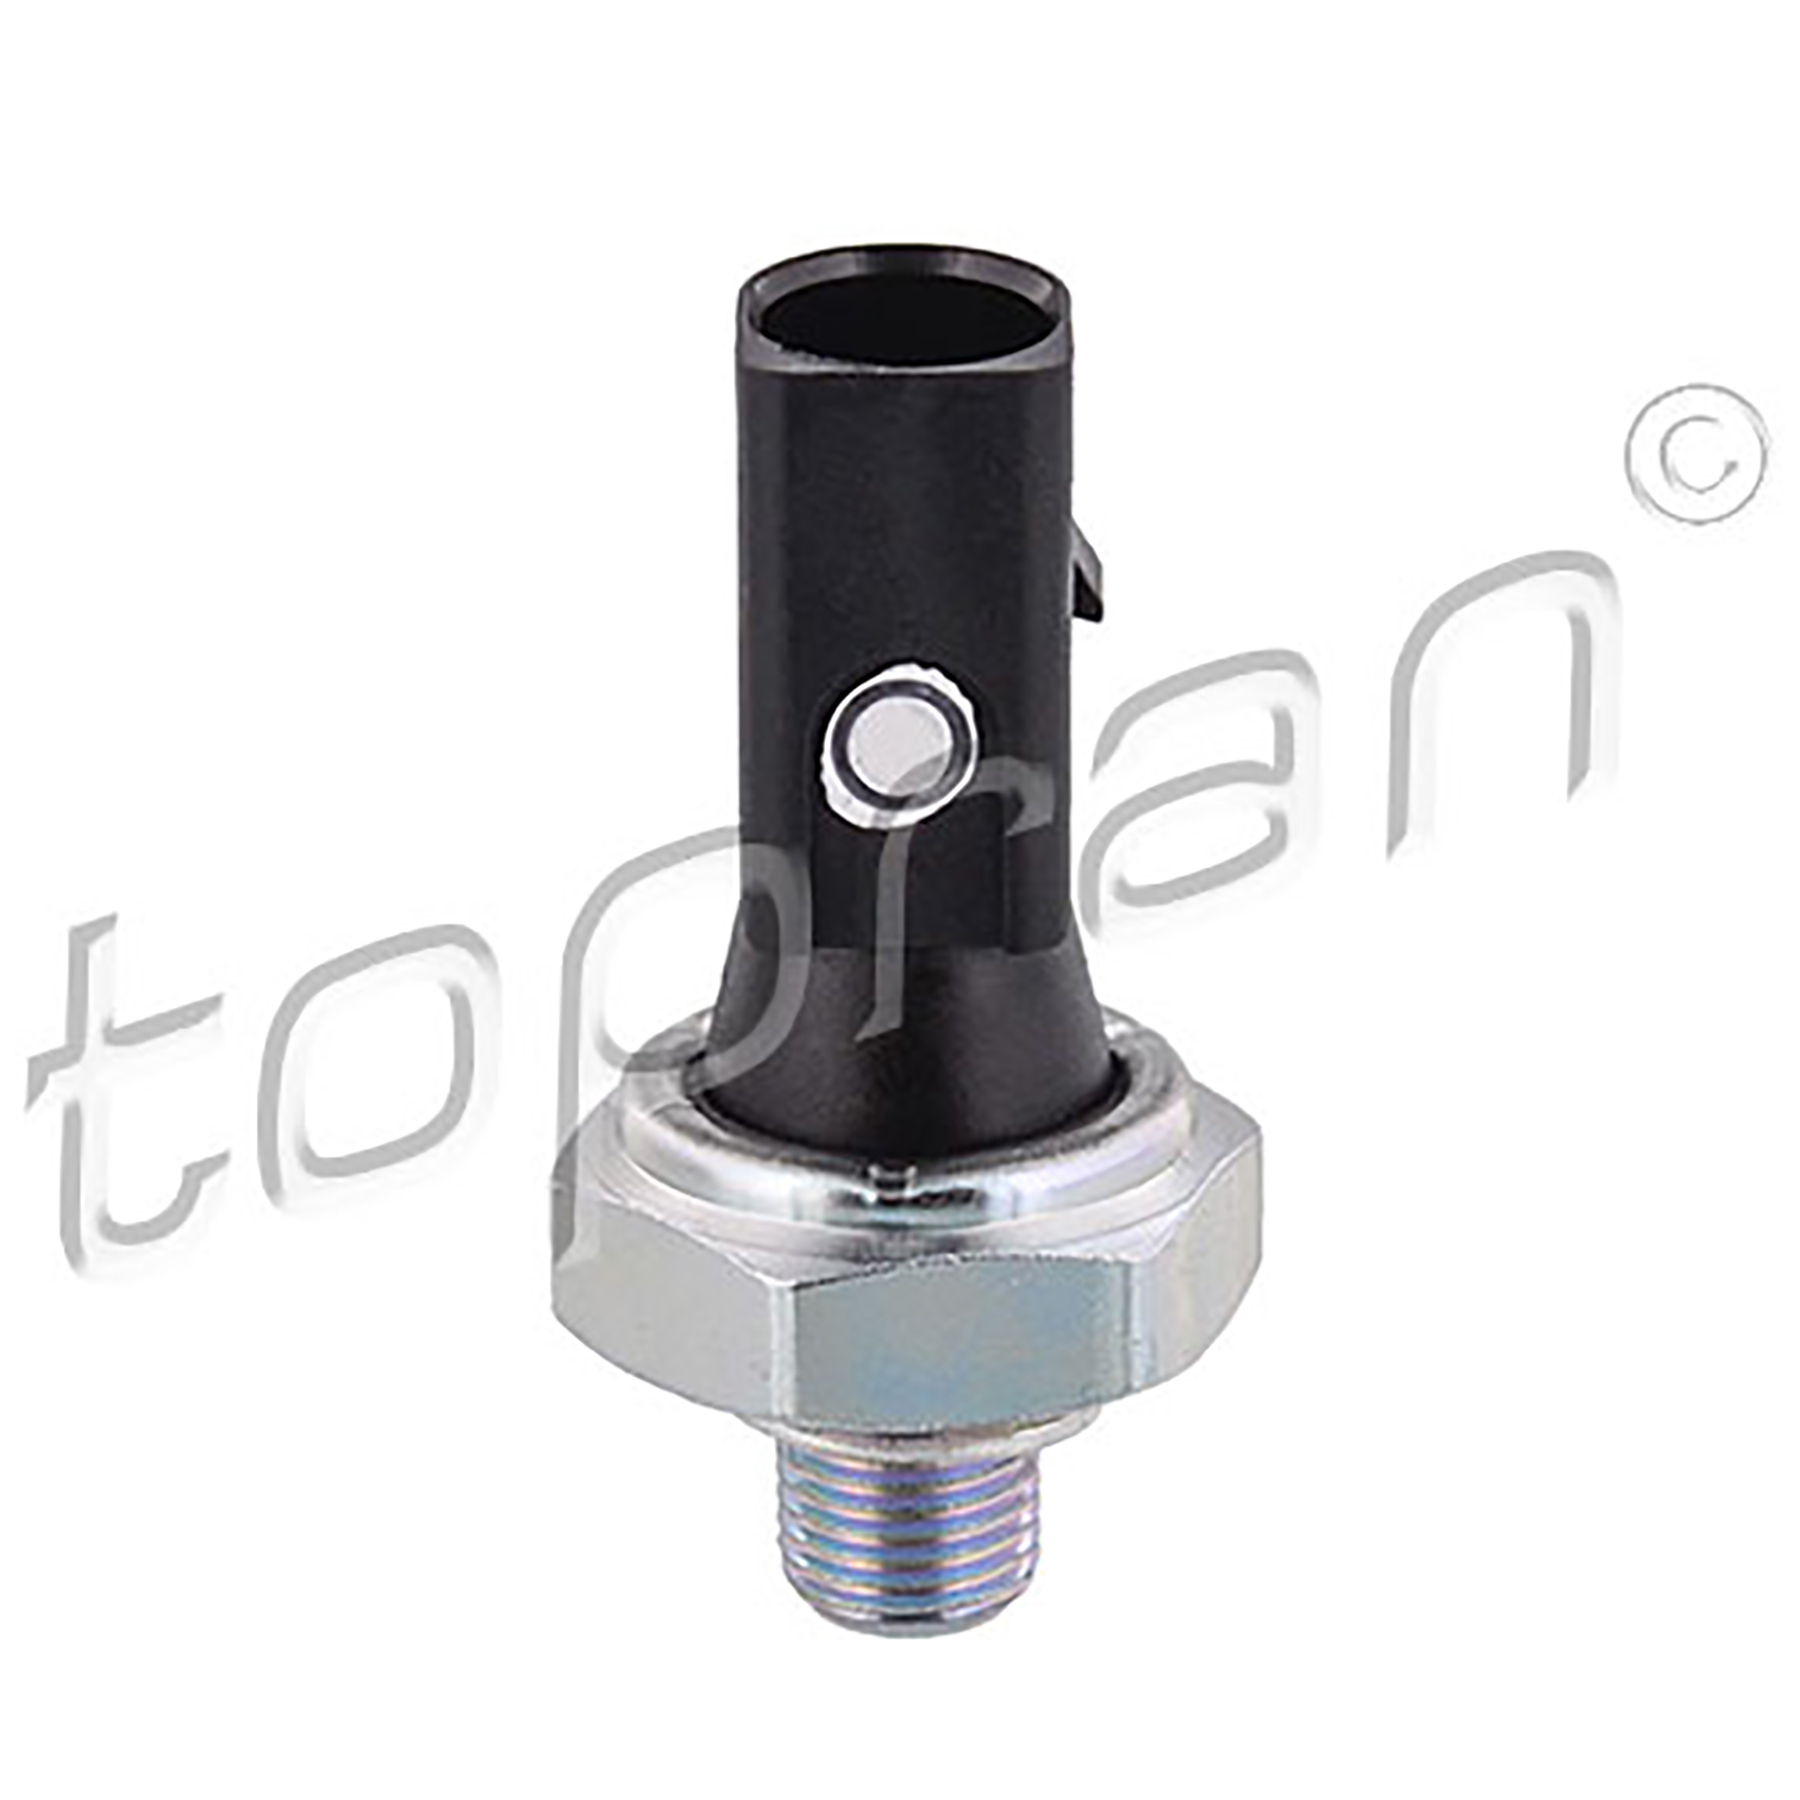 Audi A6 C6 2.0 TFSI Genuine Lemark Oil Pressure Switch Replacement